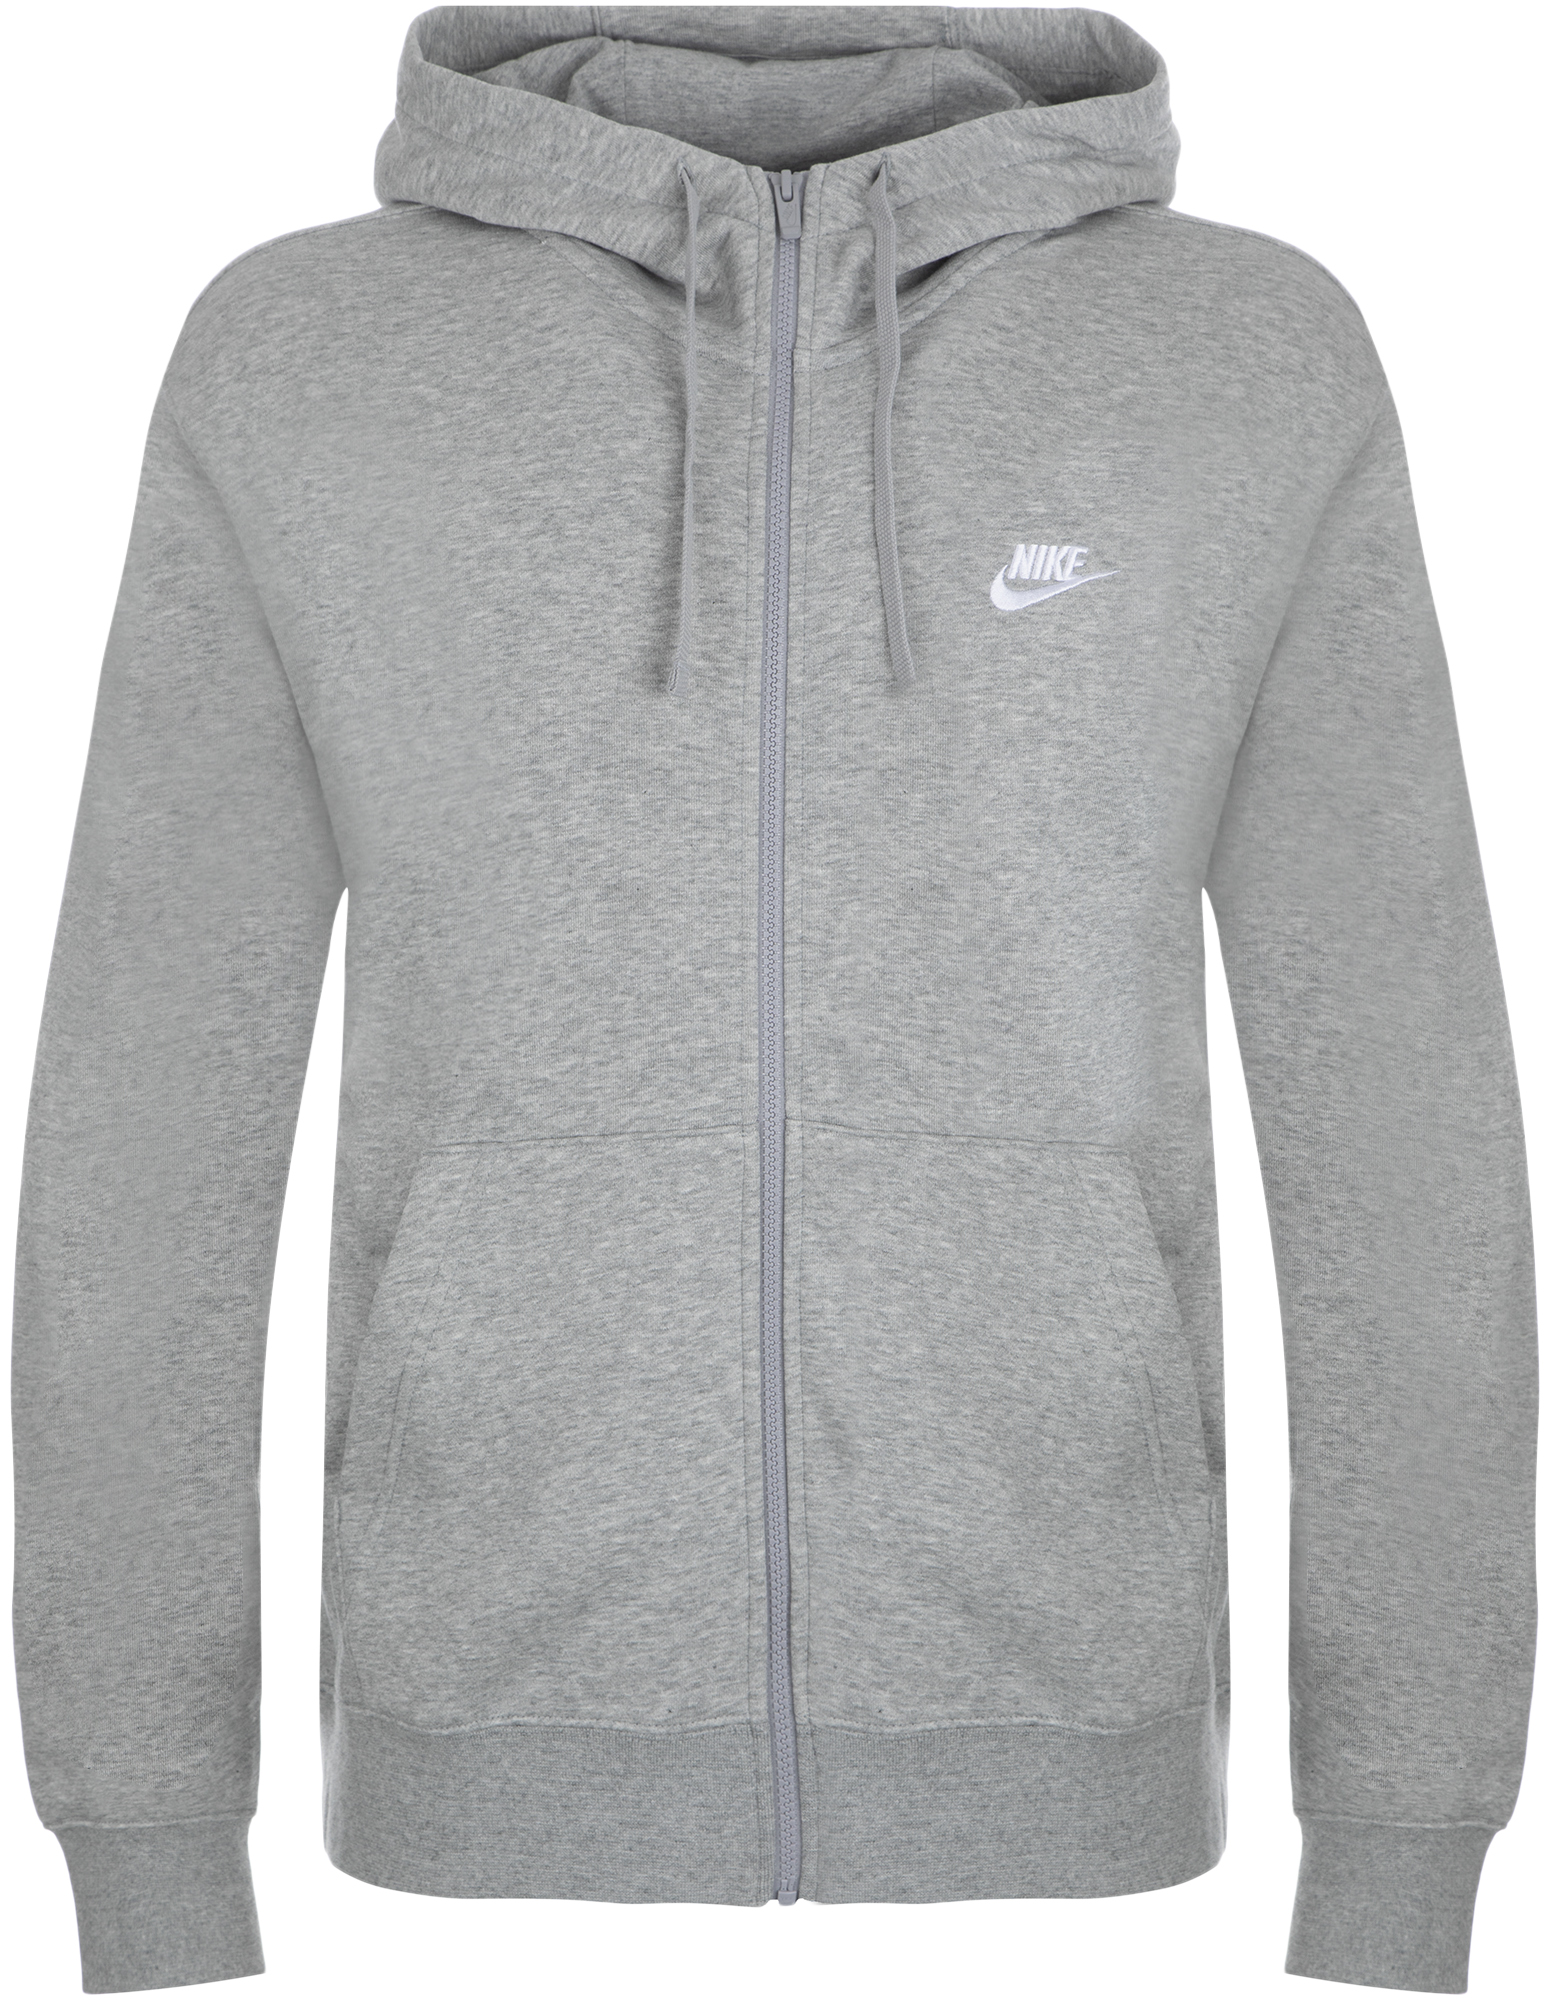 купить Nike Толстовка мужская Nike Club, размер 54-56 дешево